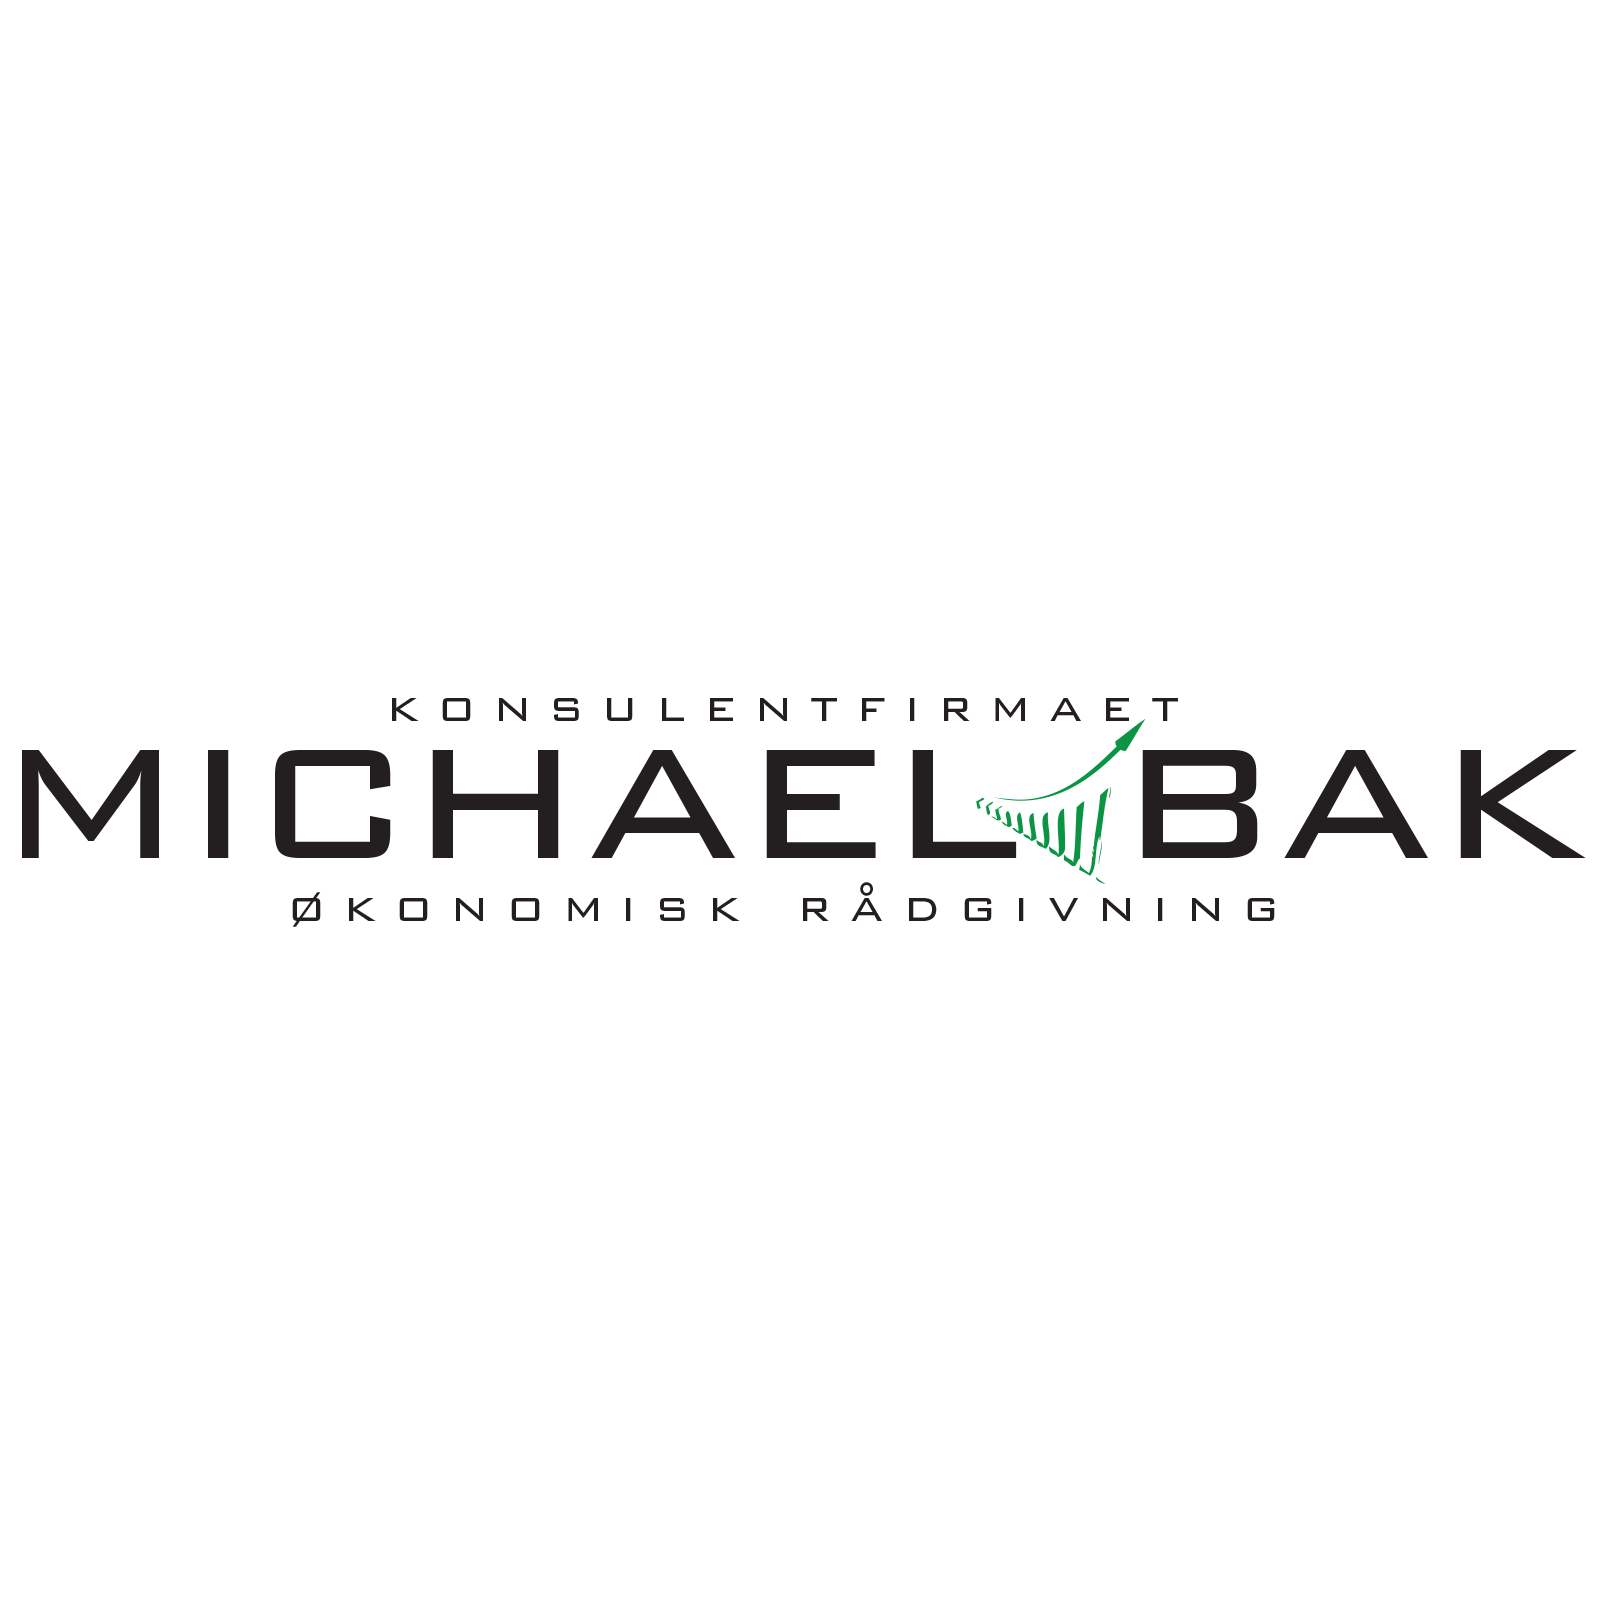 Konsulentfirmaet Michael Bak | Økonomisk Rådgivning